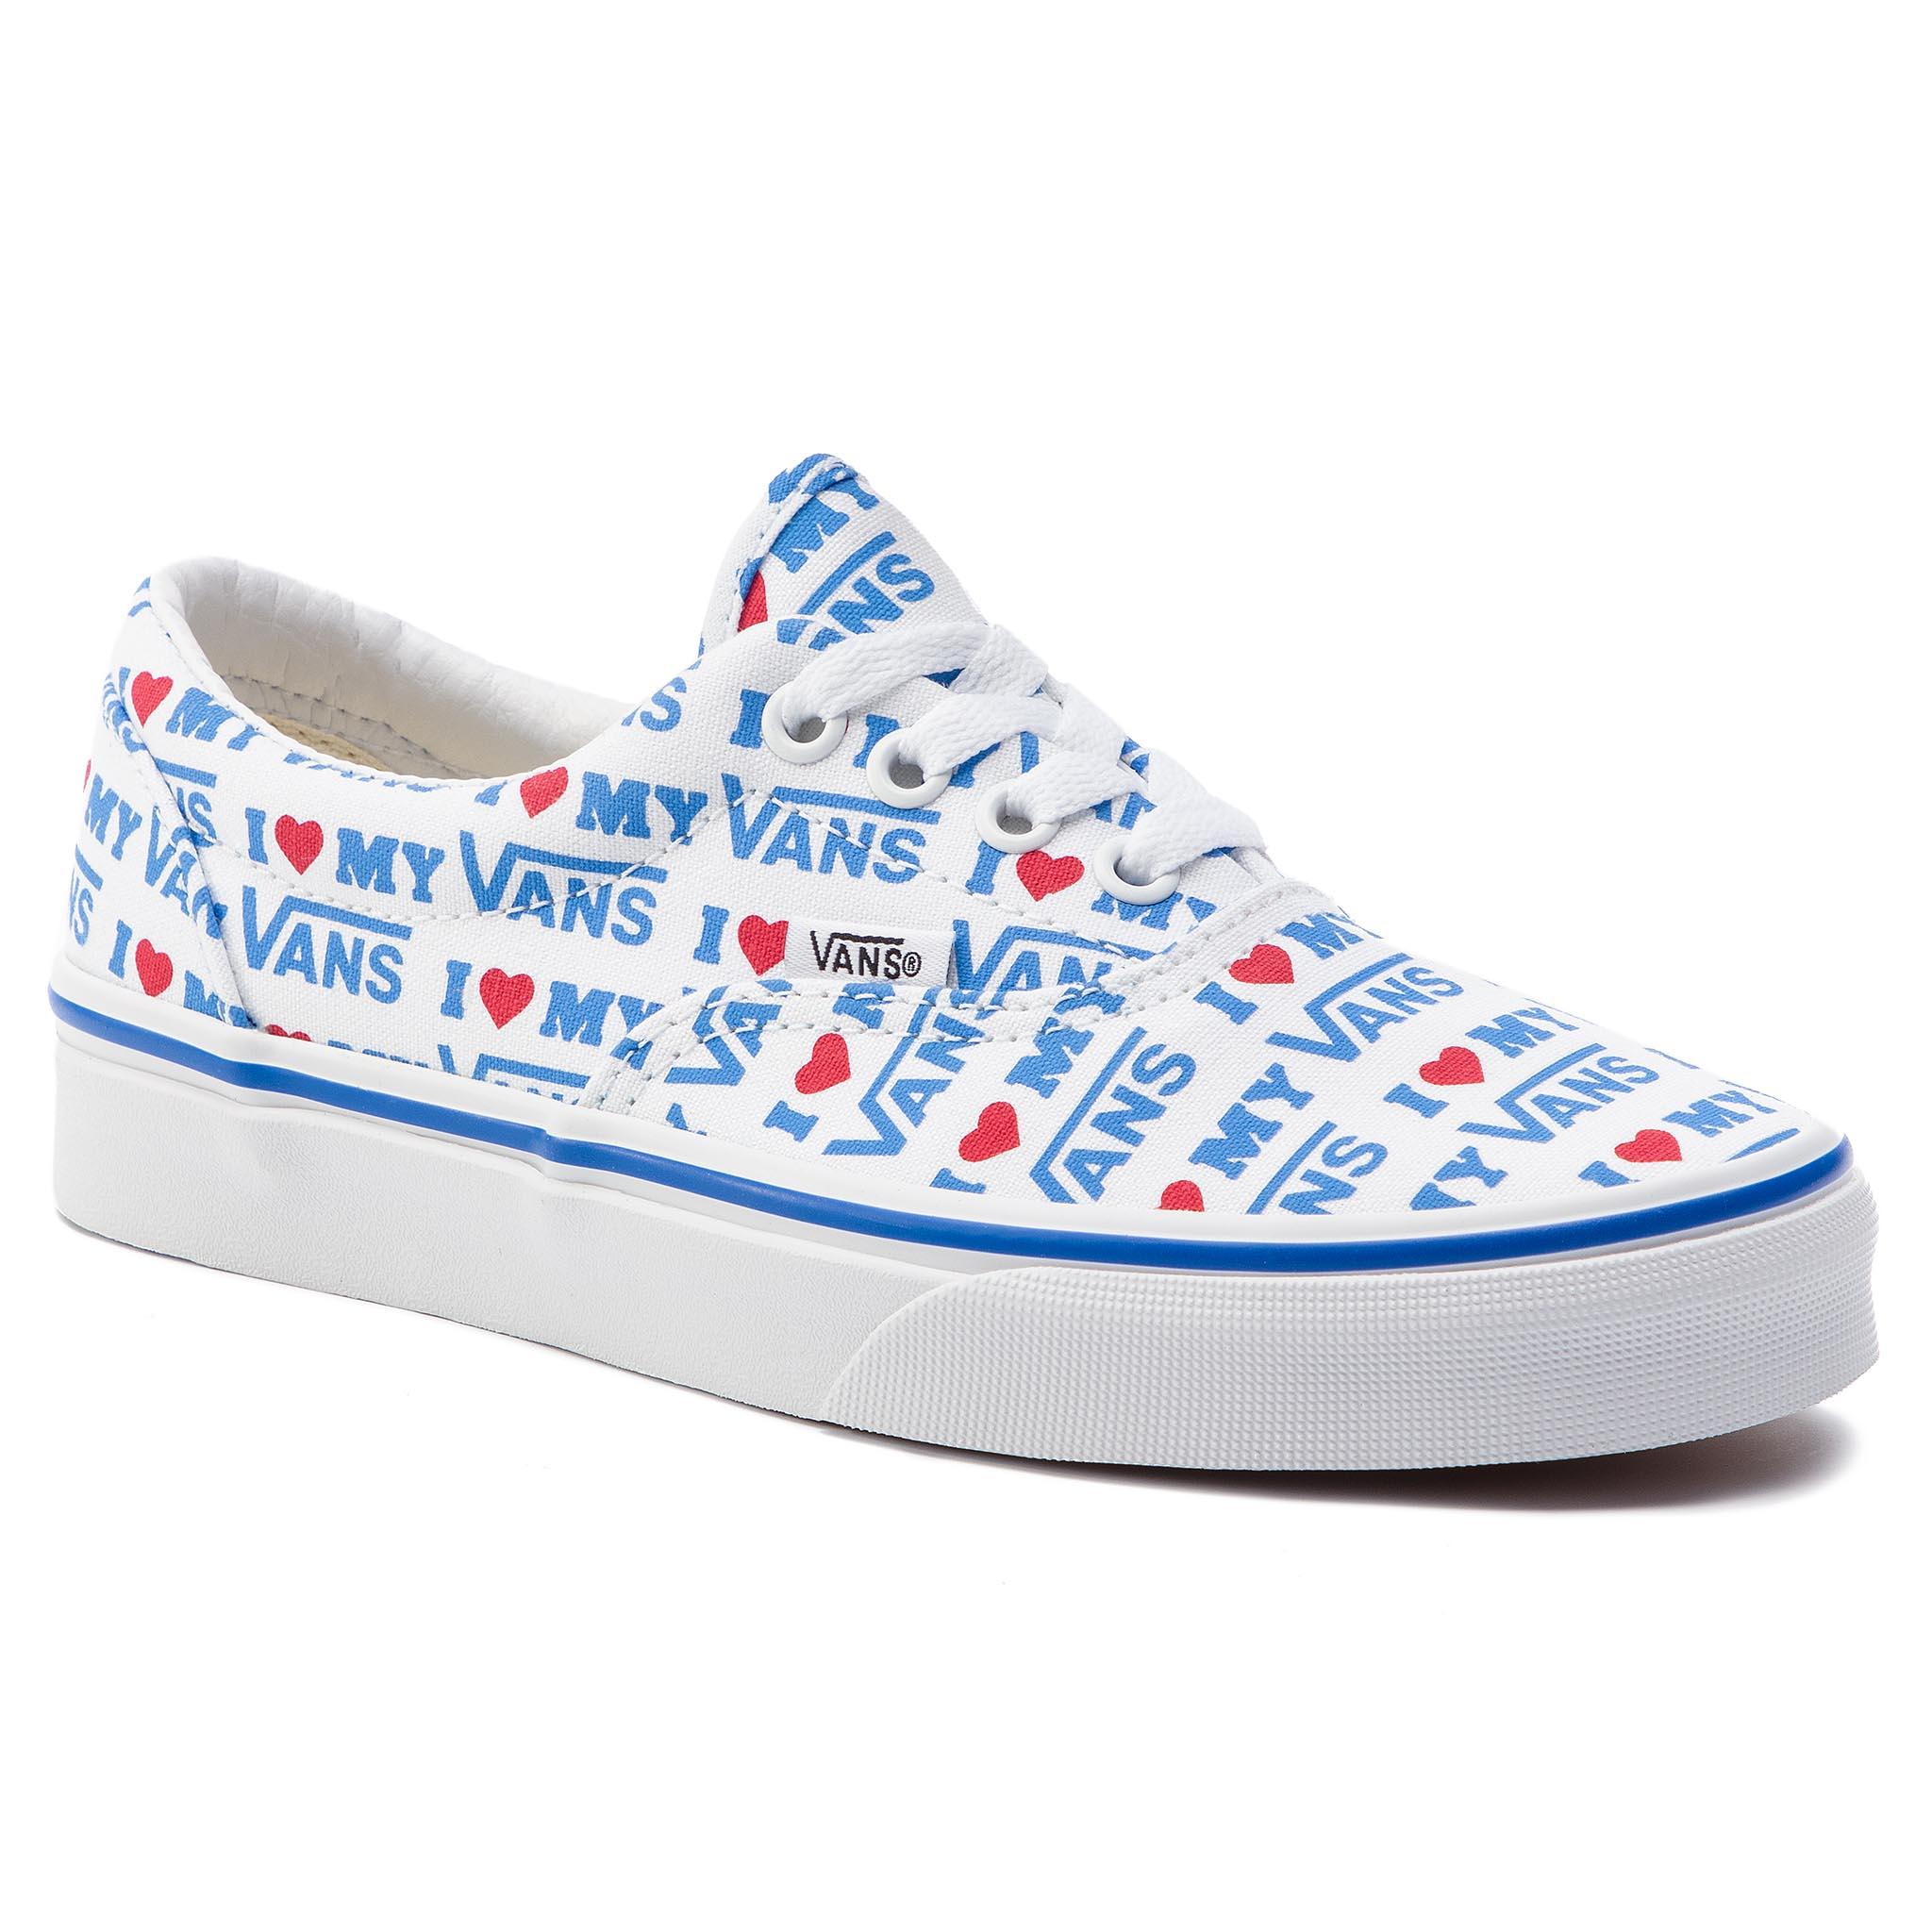 143b501c730 Πάνινα παπούτσια VANS - Era VN0A38FRVP51 (I Heart Vans) True White ...